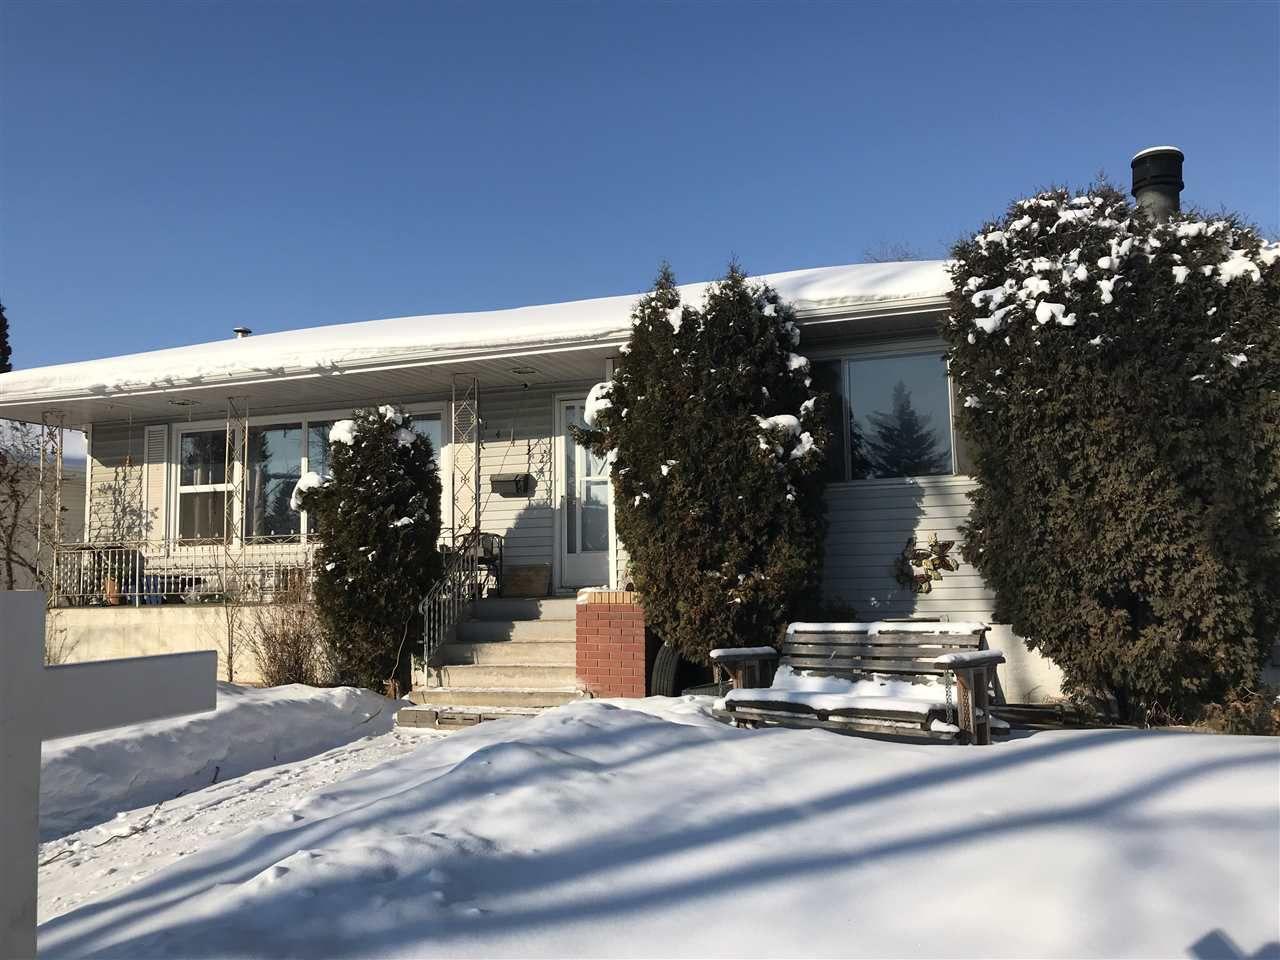 Main Photo: 14432 87 Avenue in Edmonton: Zone 10 House for sale : MLS®# E4143531